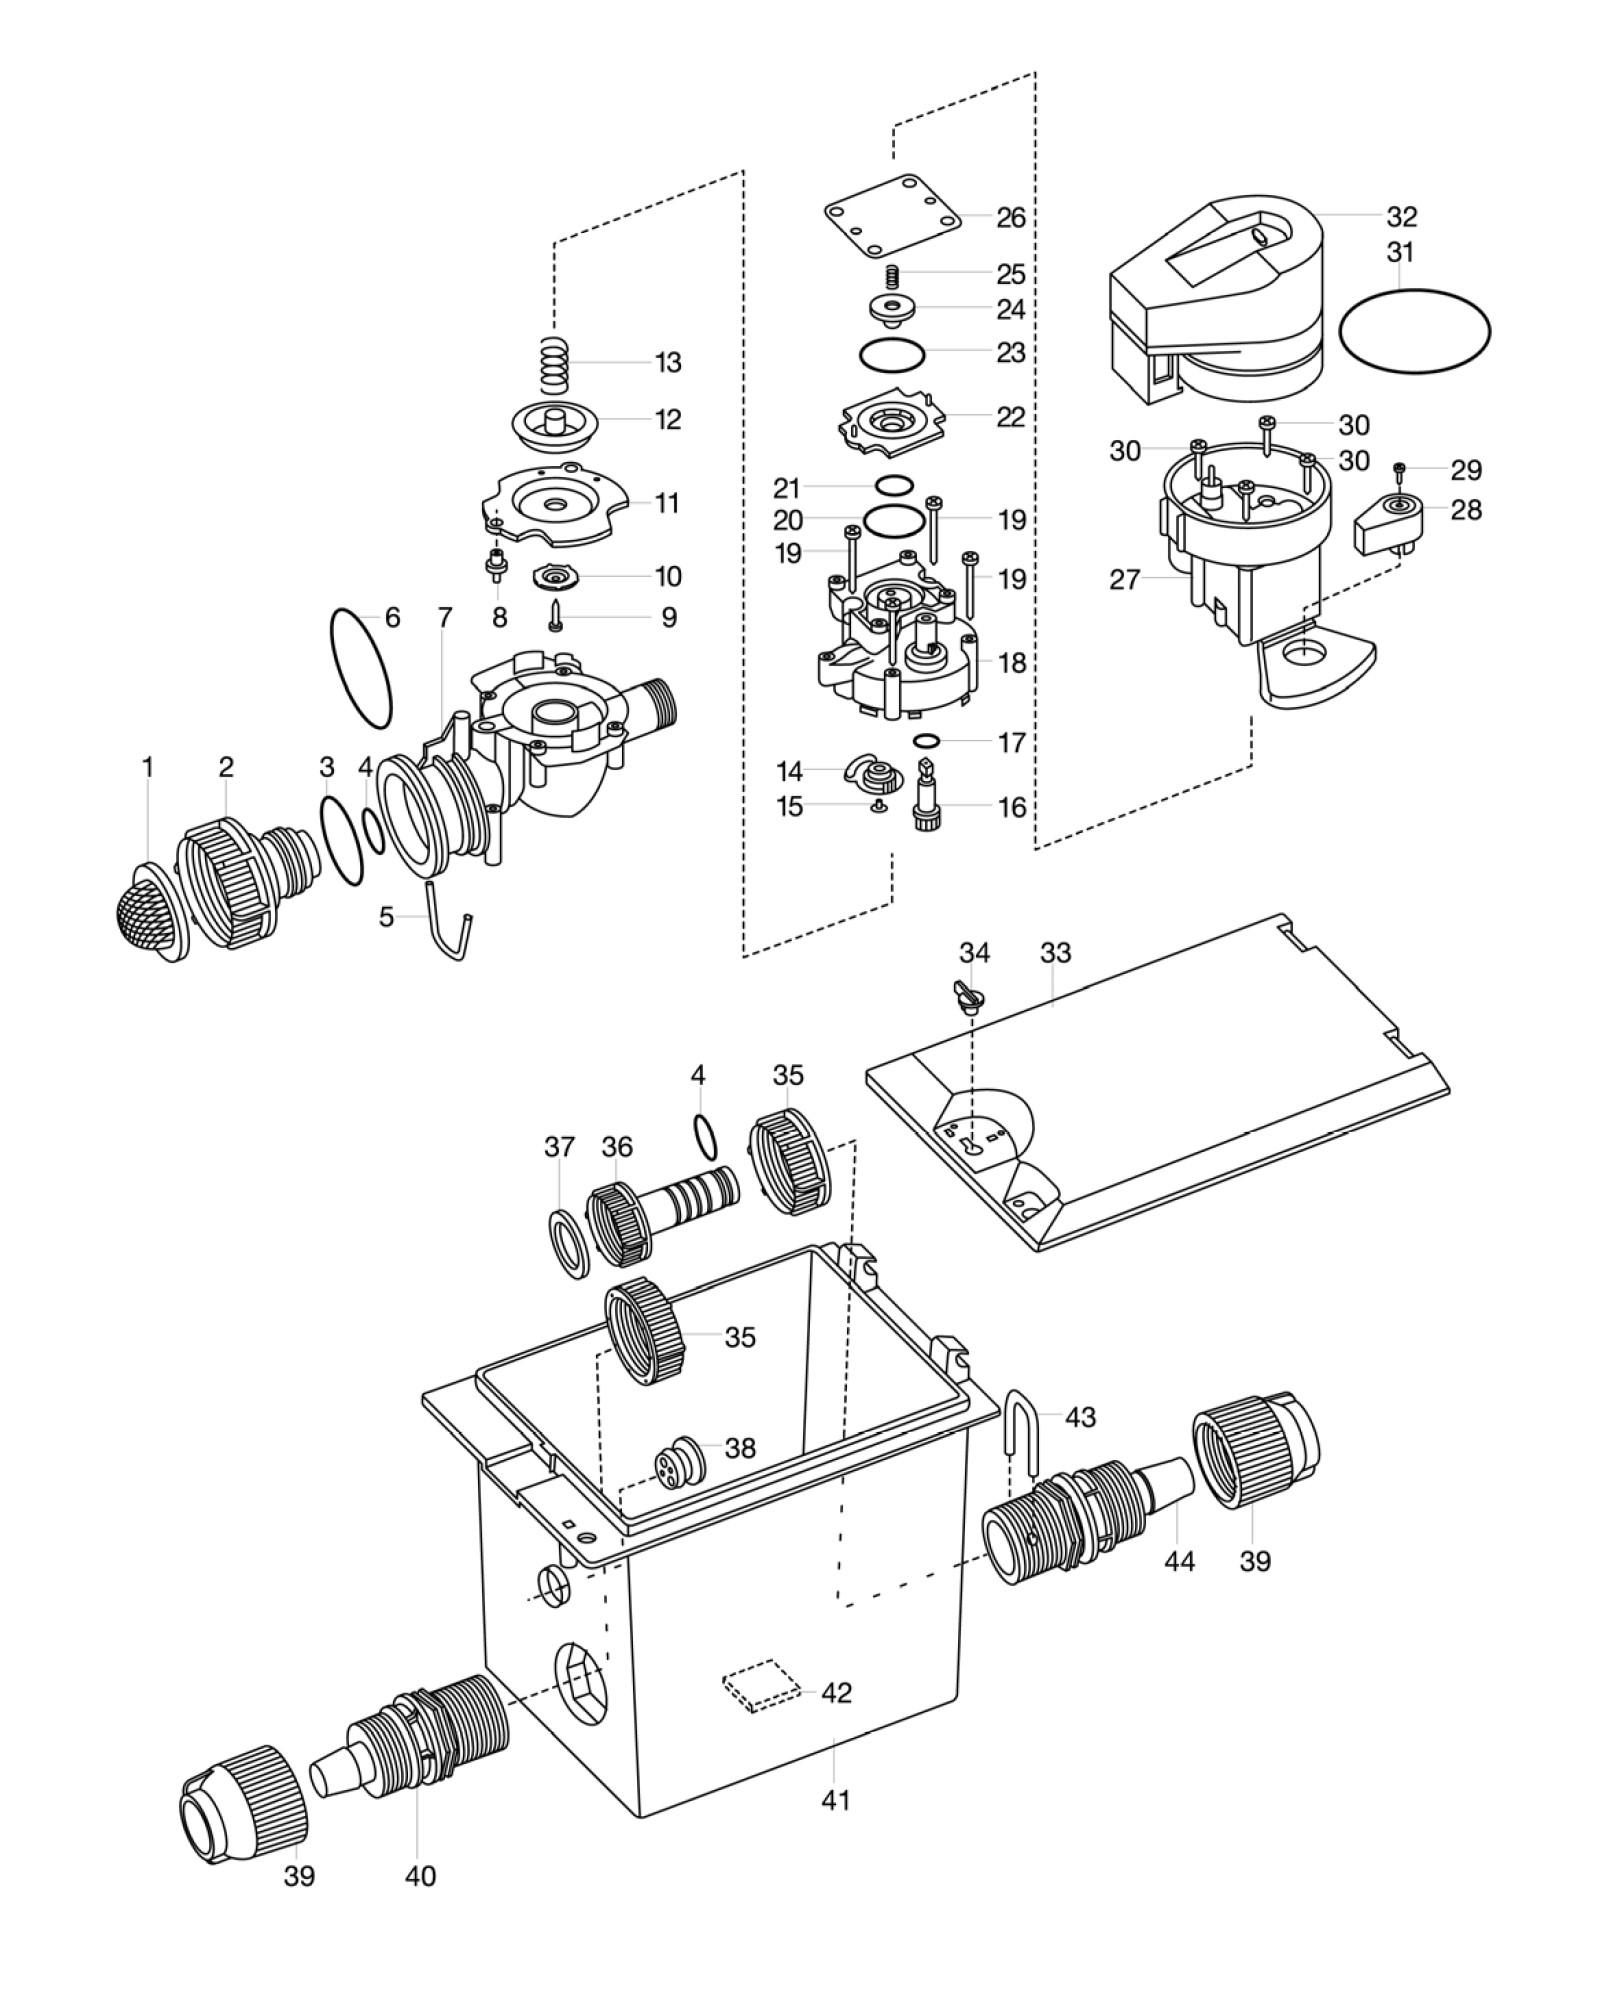 ersatzteile gardena automatikventil 1060 u 1241. Black Bedroom Furniture Sets. Home Design Ideas